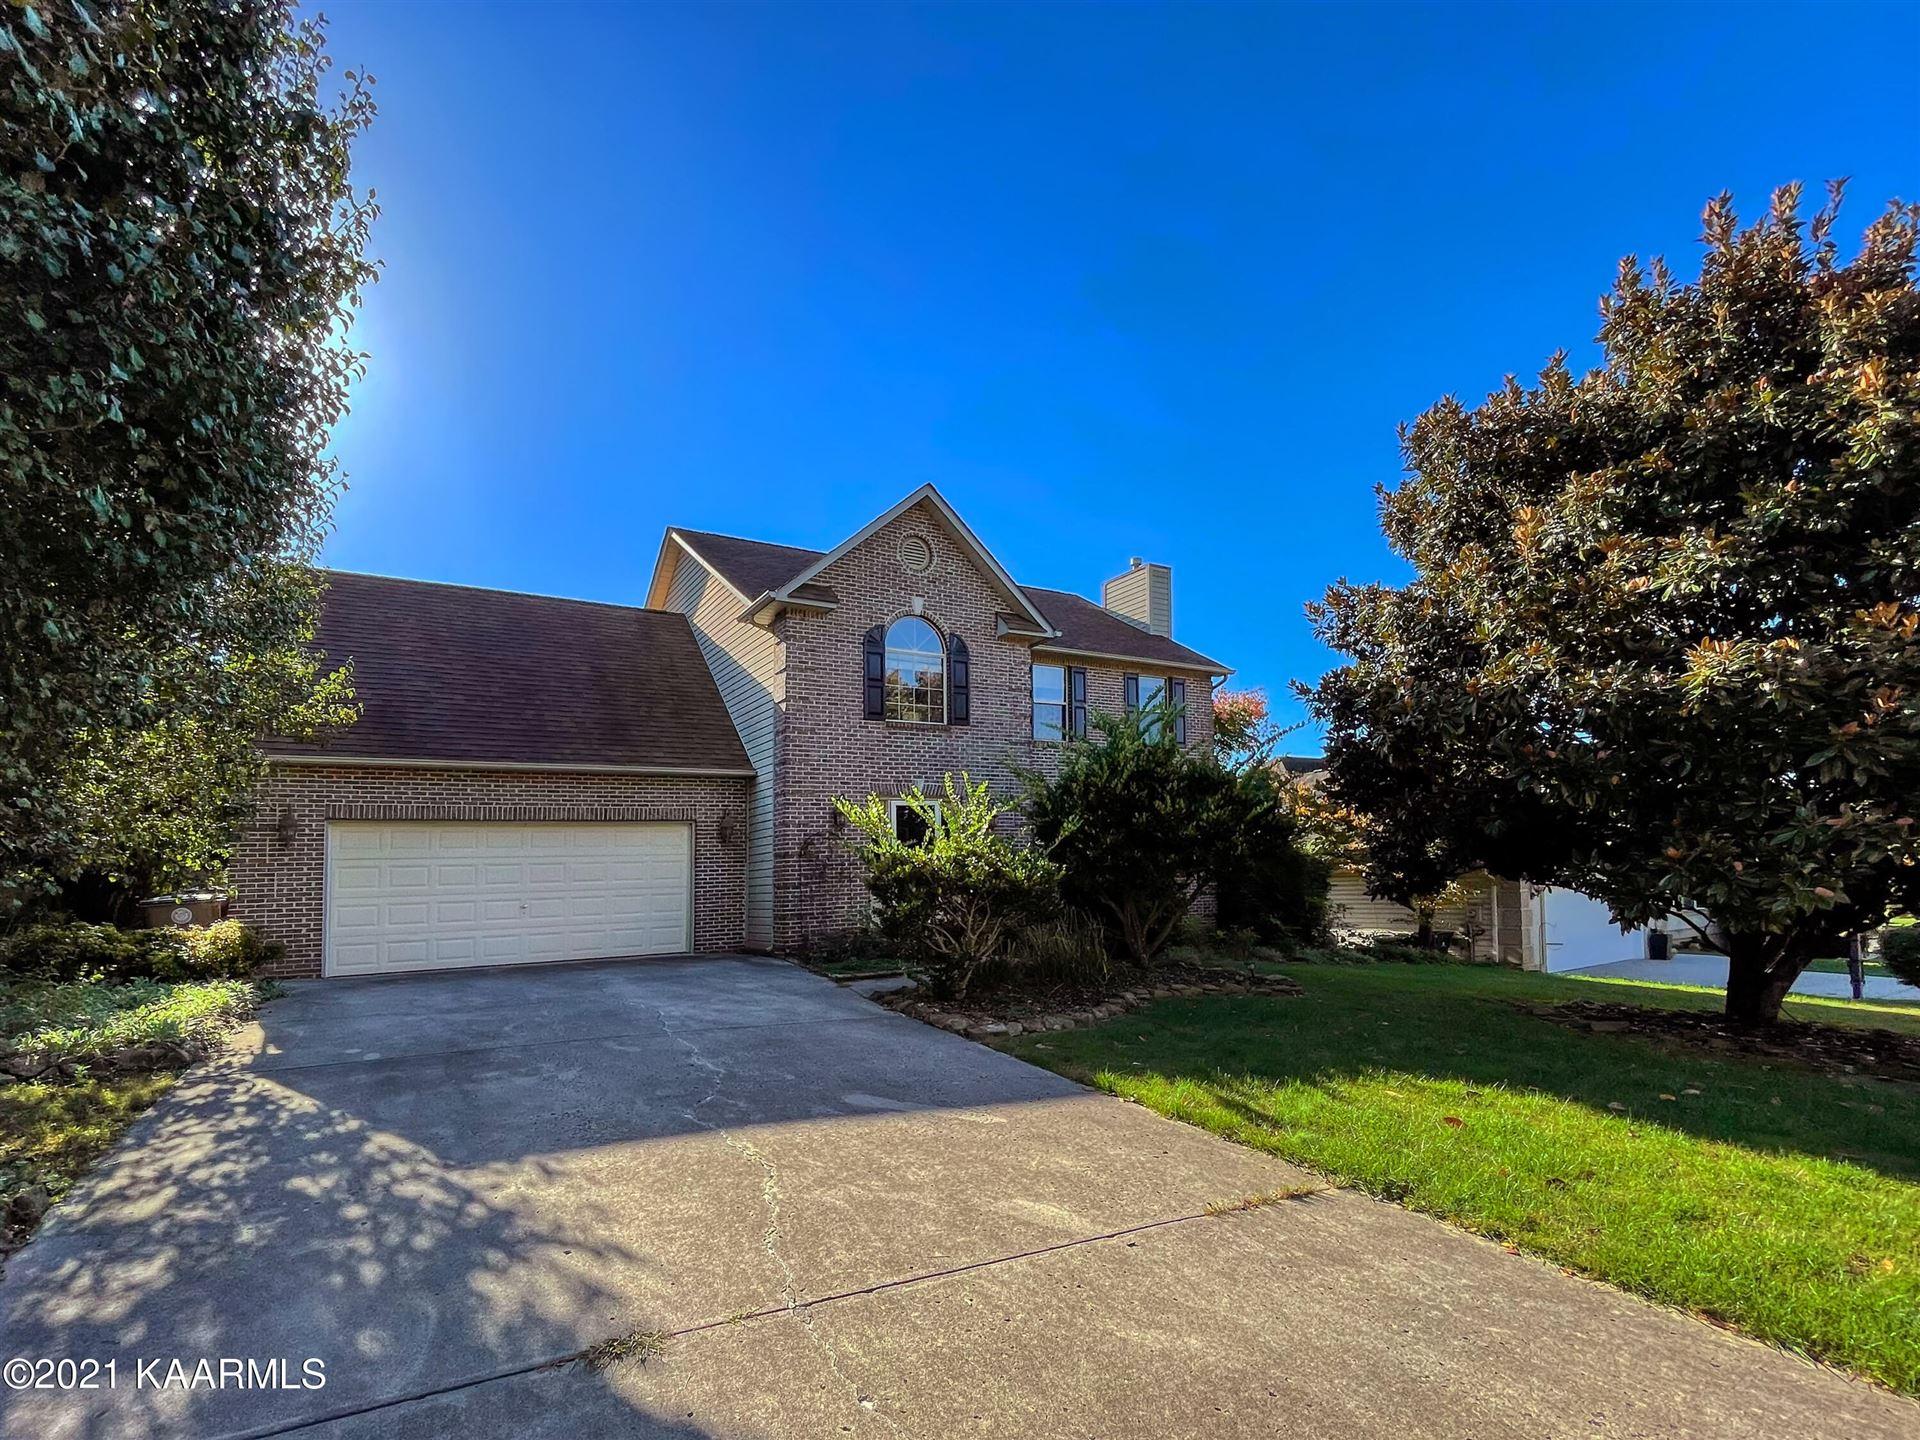 Photo of 7256 Ashburton Drive, Knoxville, TN 37909 (MLS # 1170926)